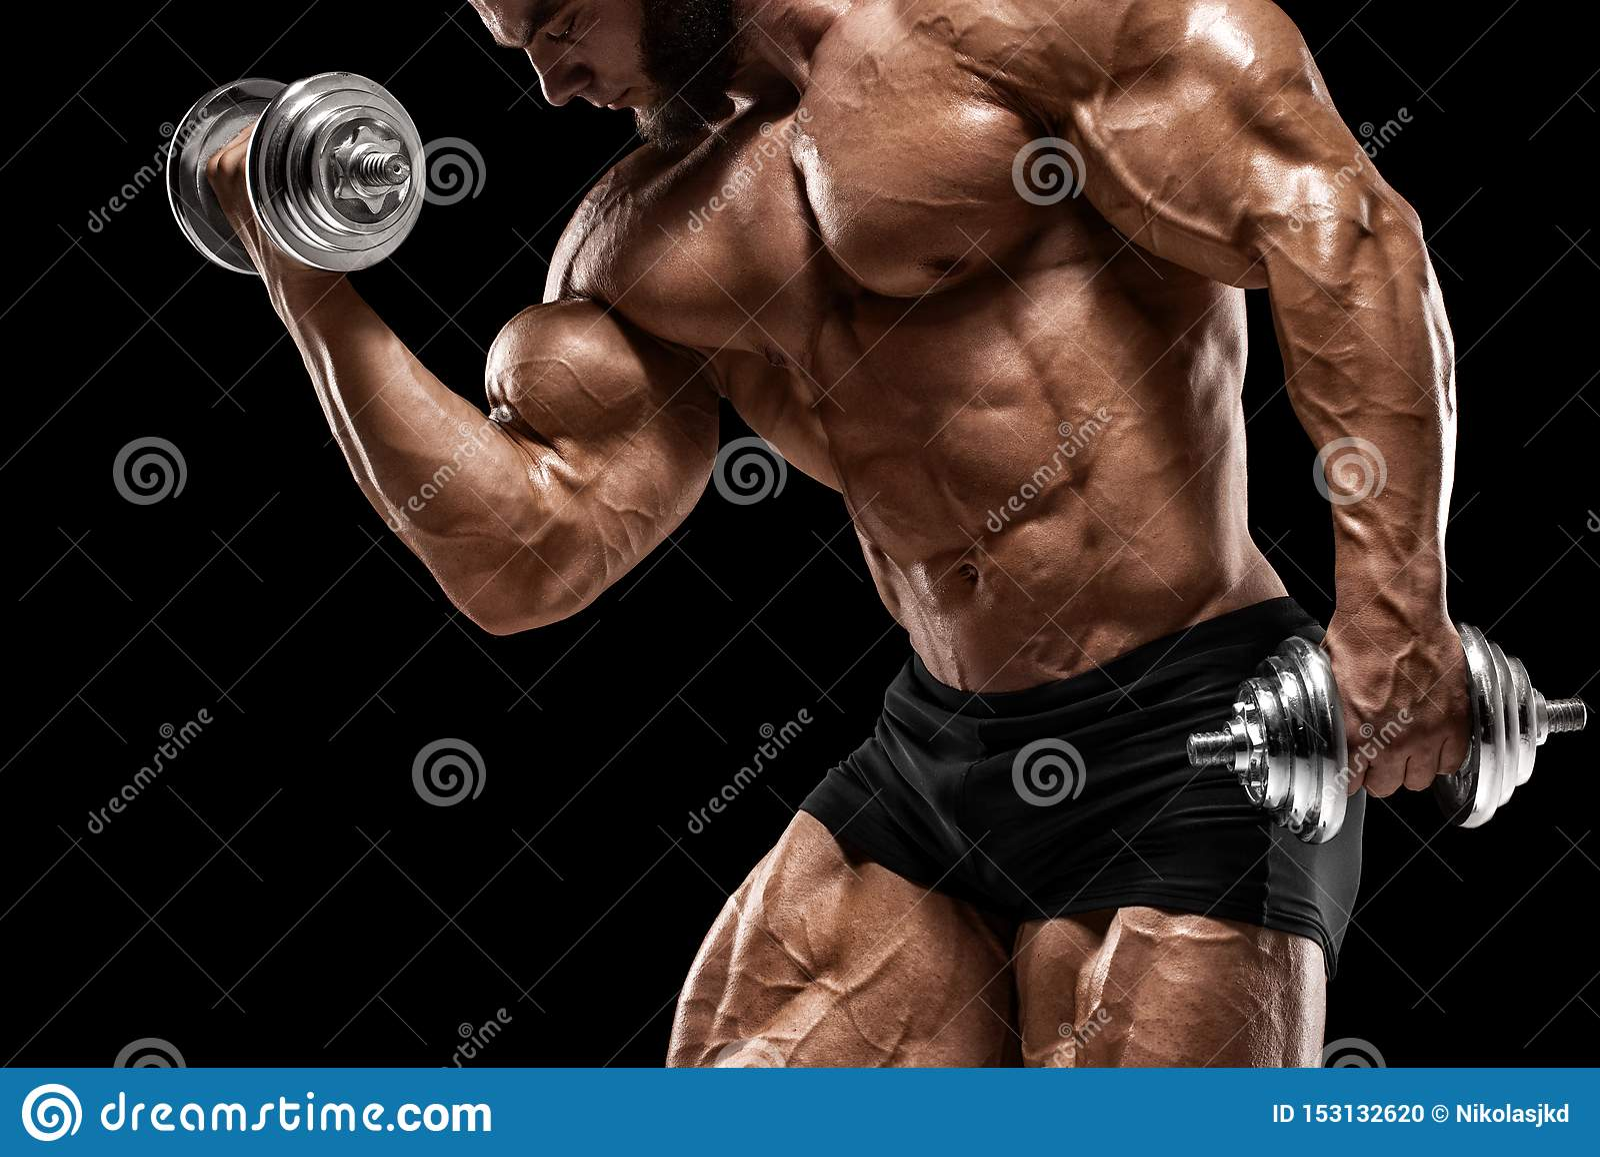 Bodybuilder black Nathan's Muscle